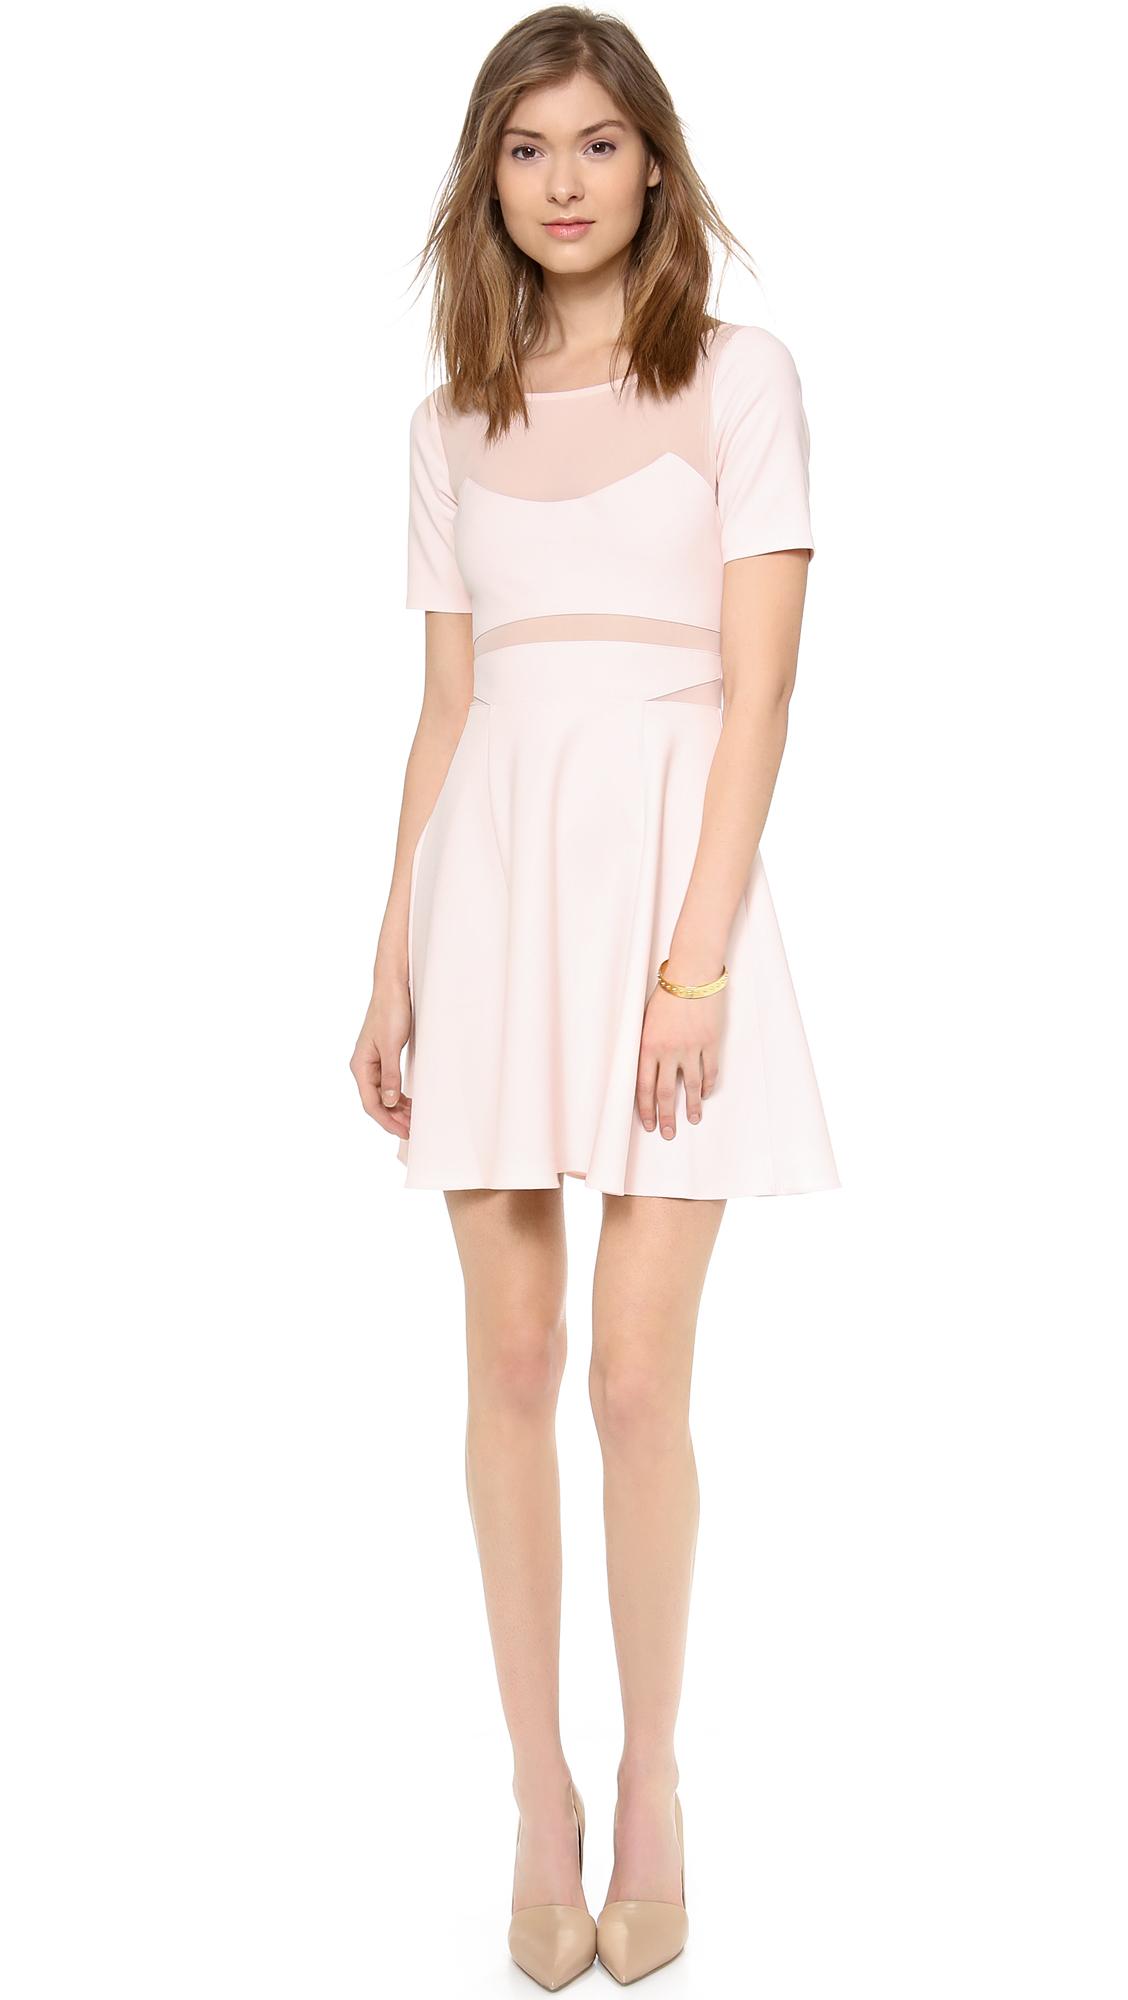 Elizabeth and James Selena light pink short-sleeve dress with sheer inserts ($365)